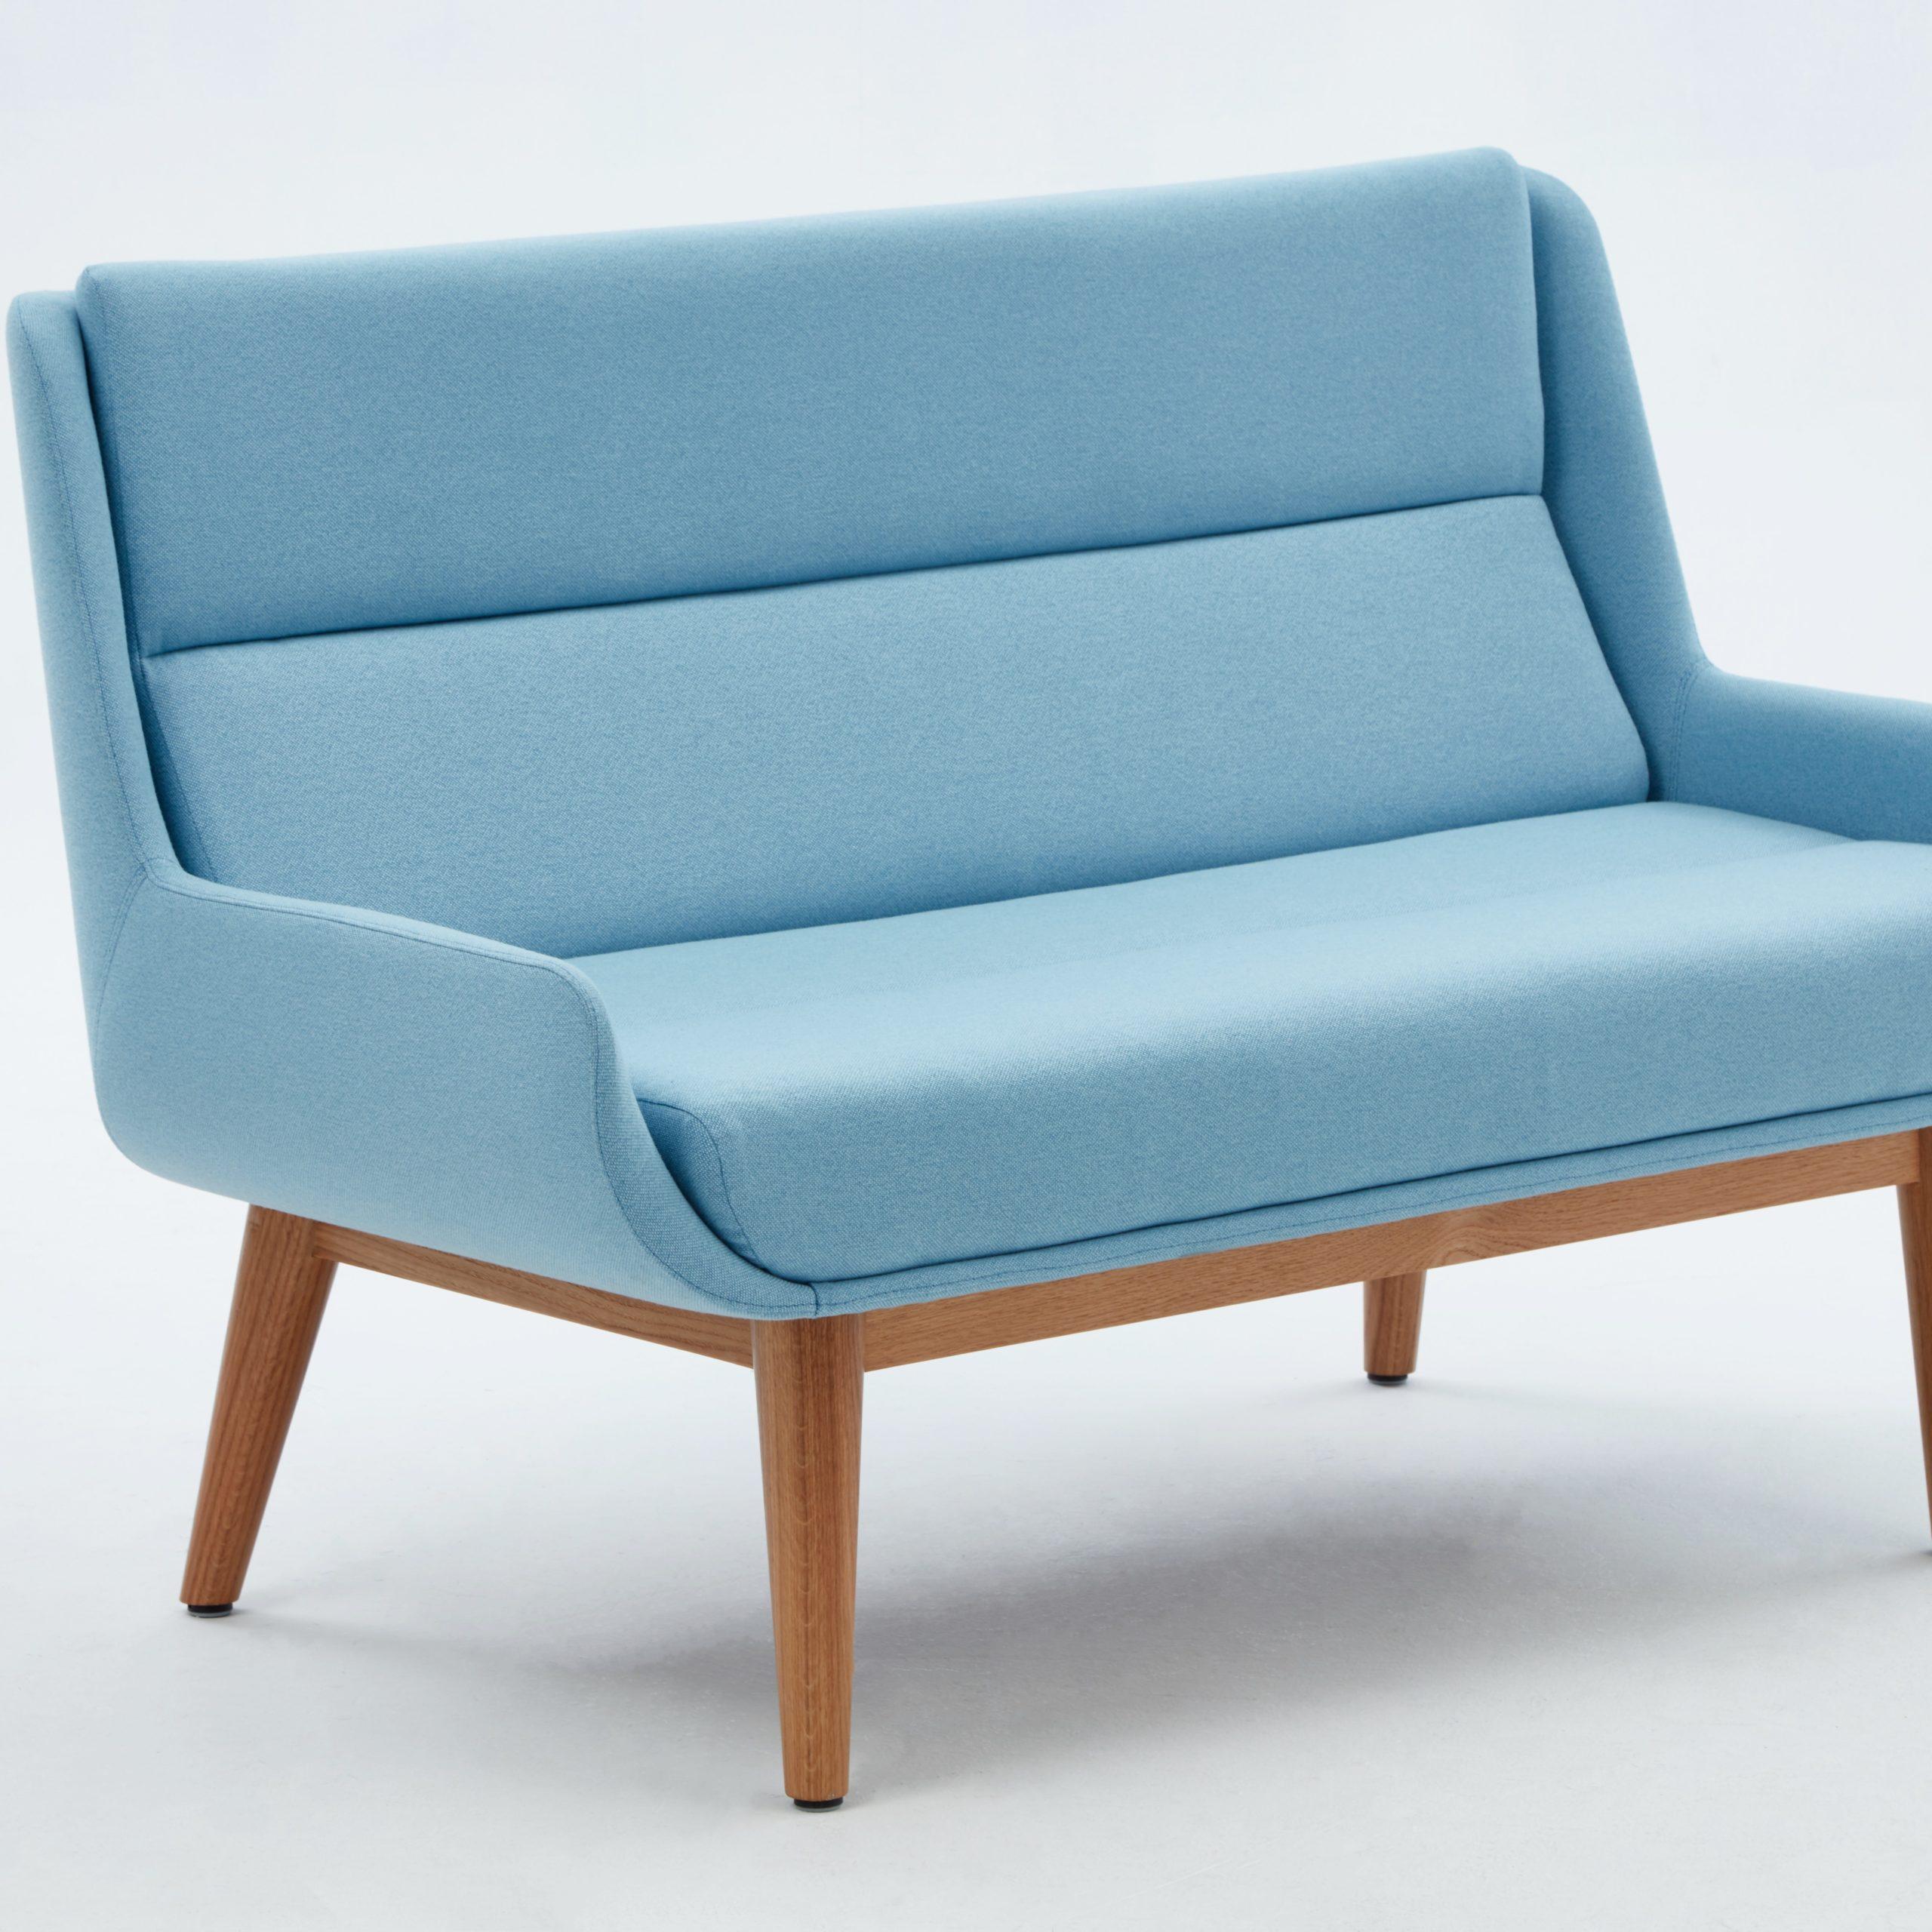 sofa-hush-low-naughtone-scaled